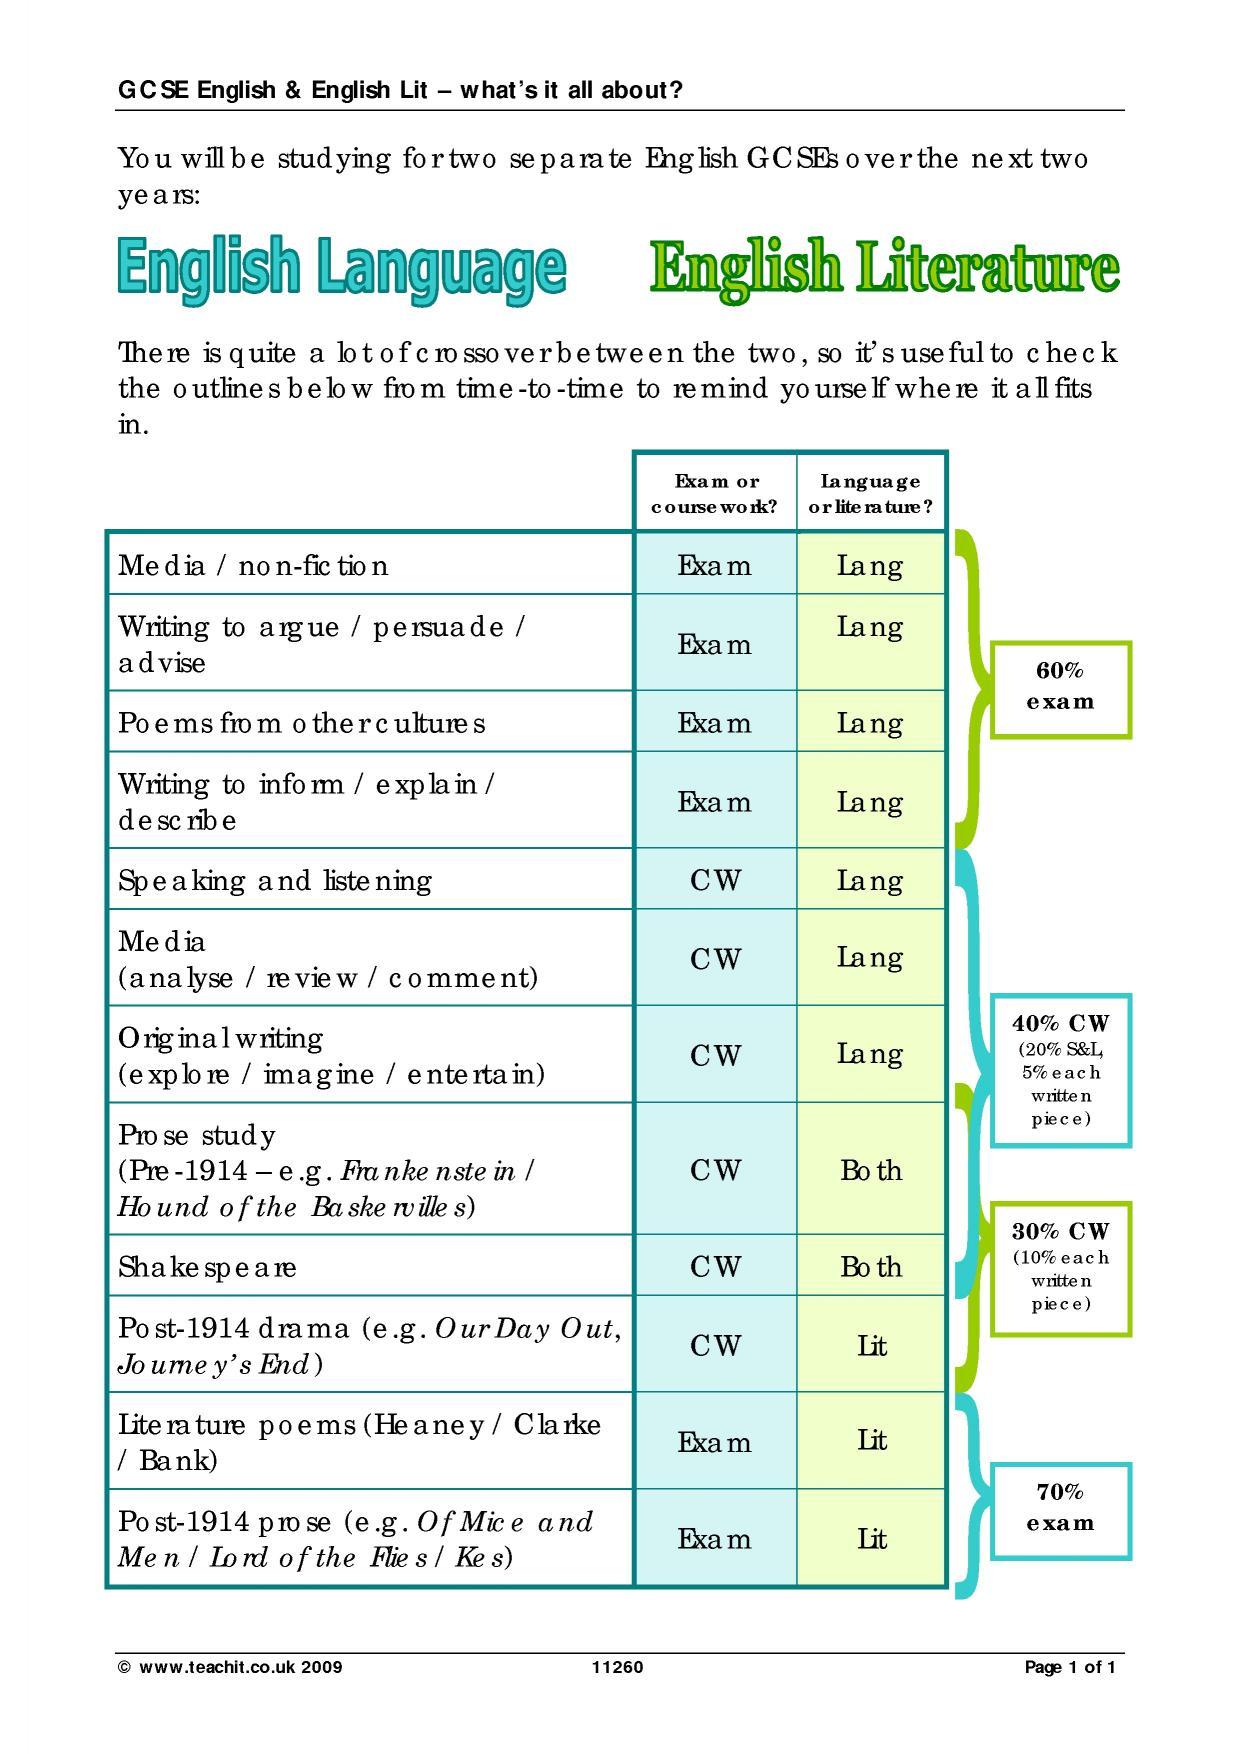 aqa english coursework percentage